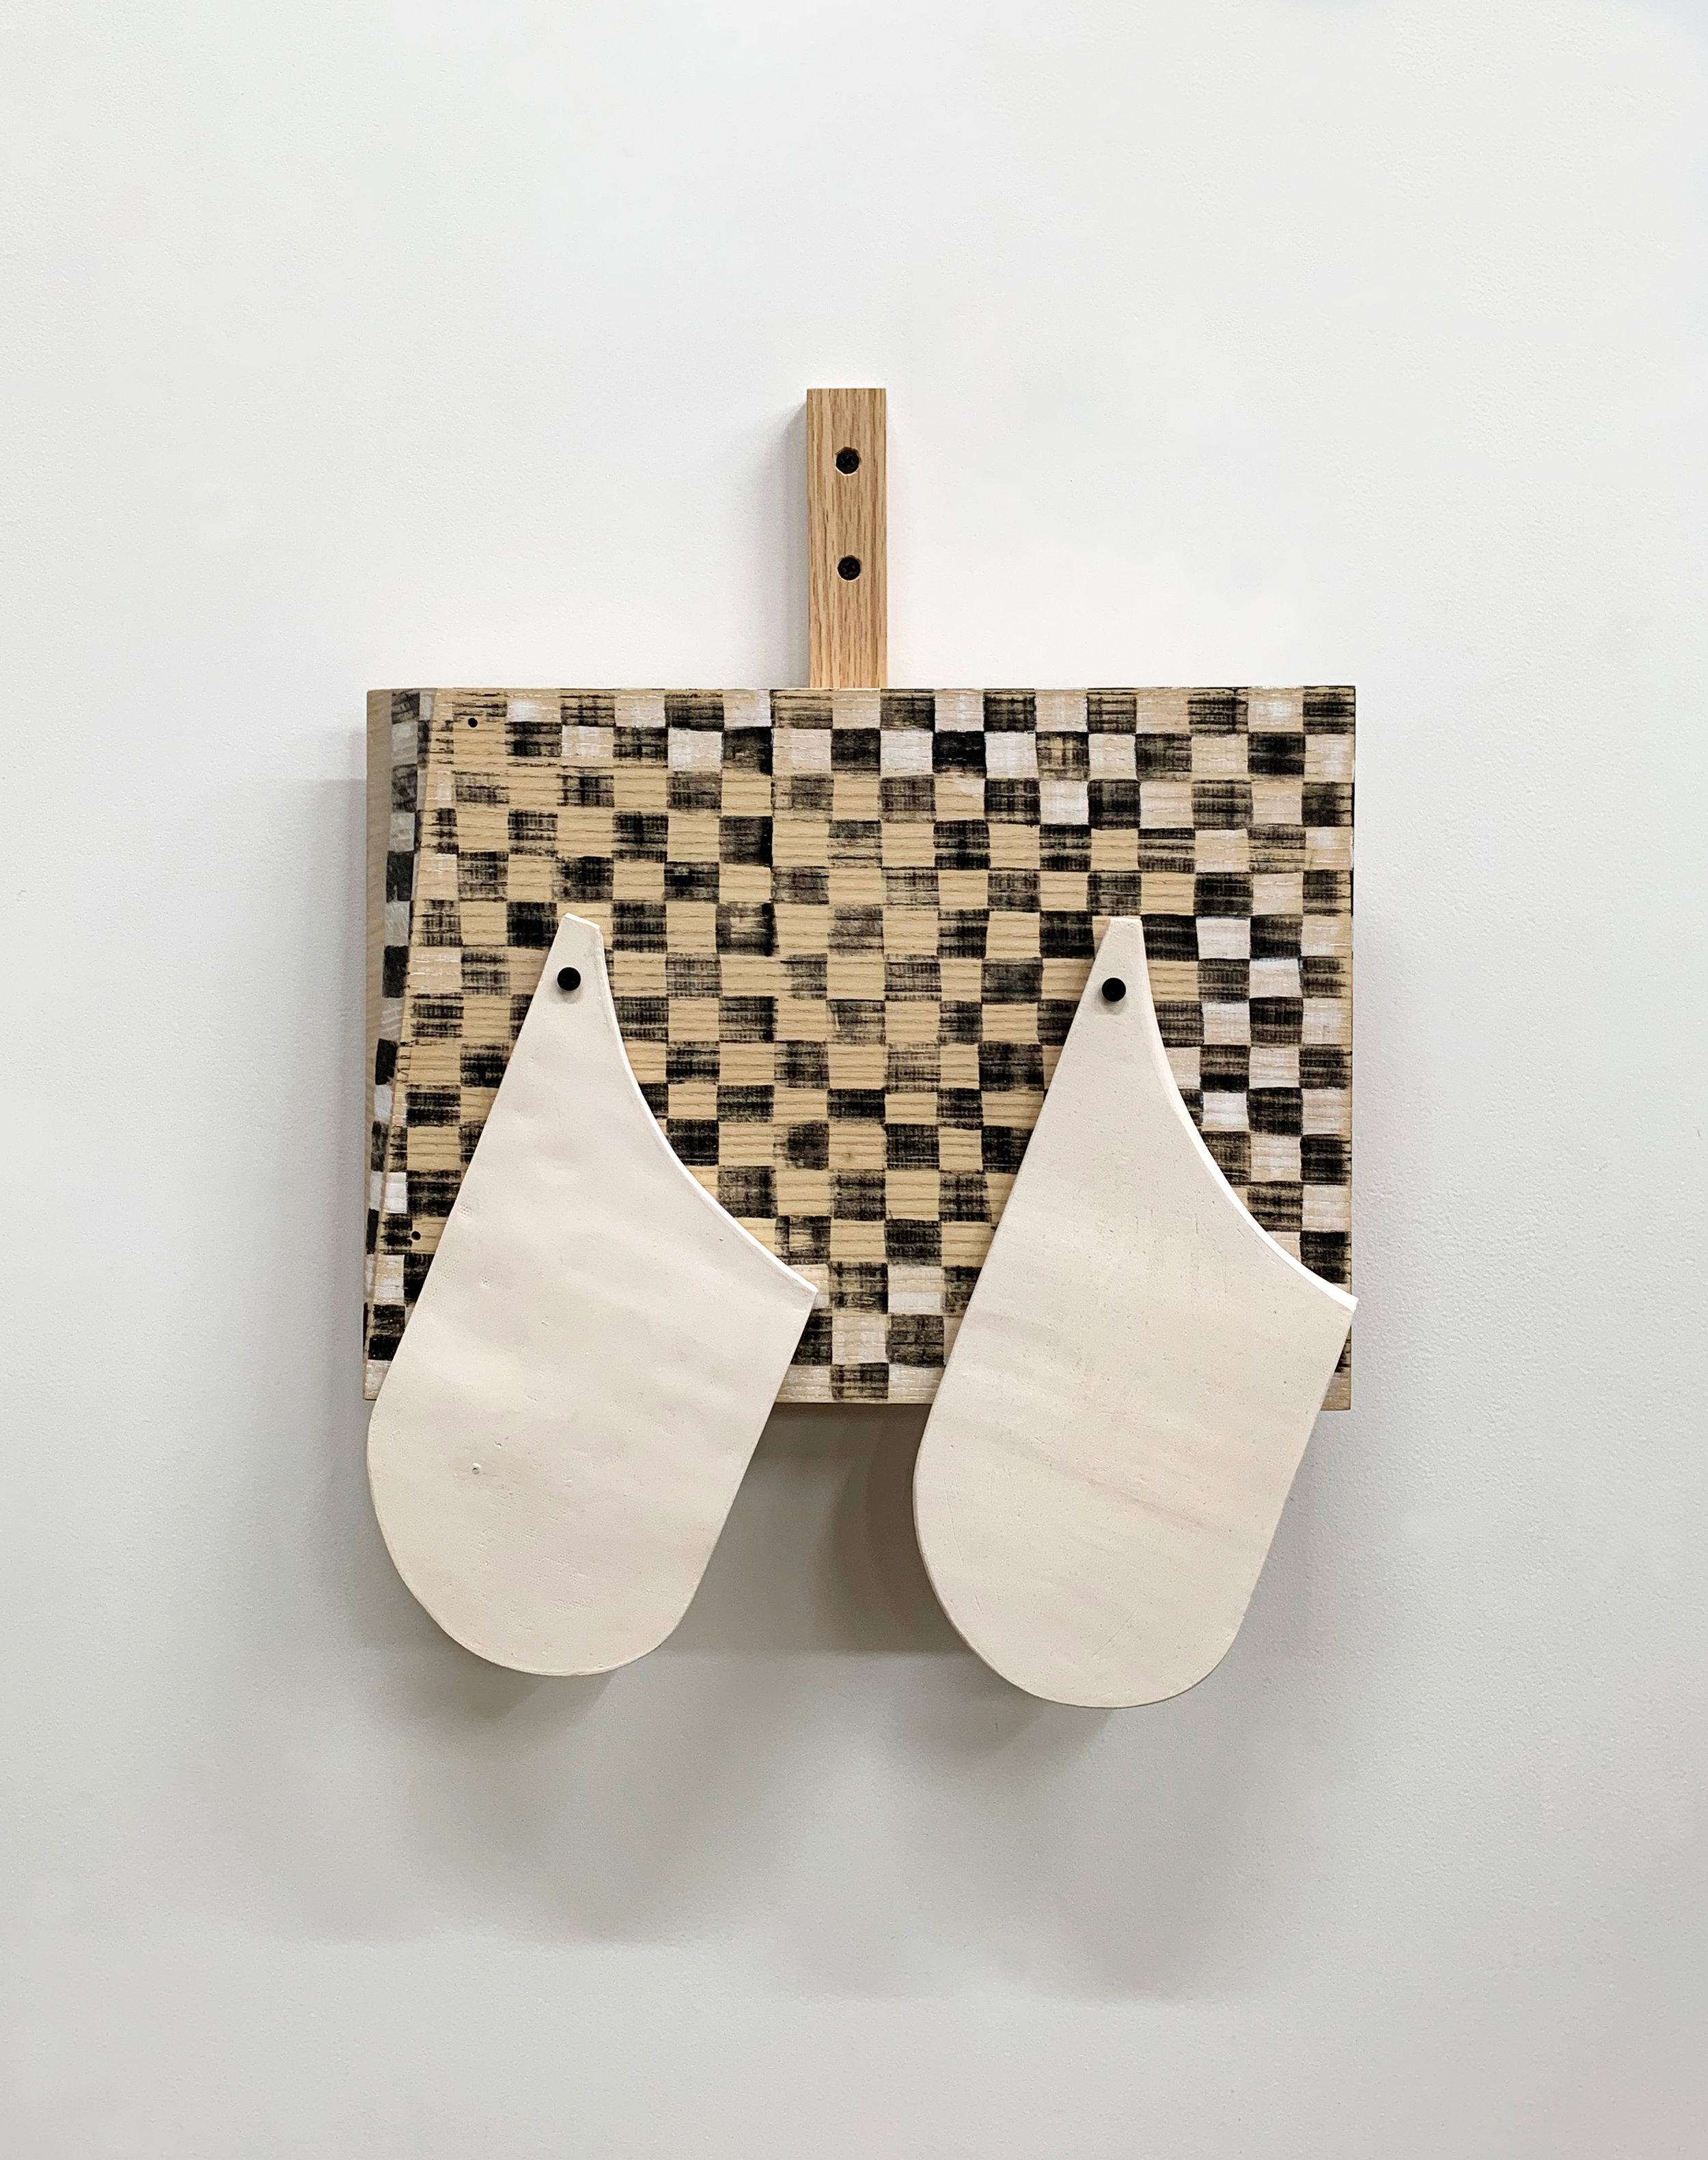 Untitled, 2019, wood, paint, earthenware, screws